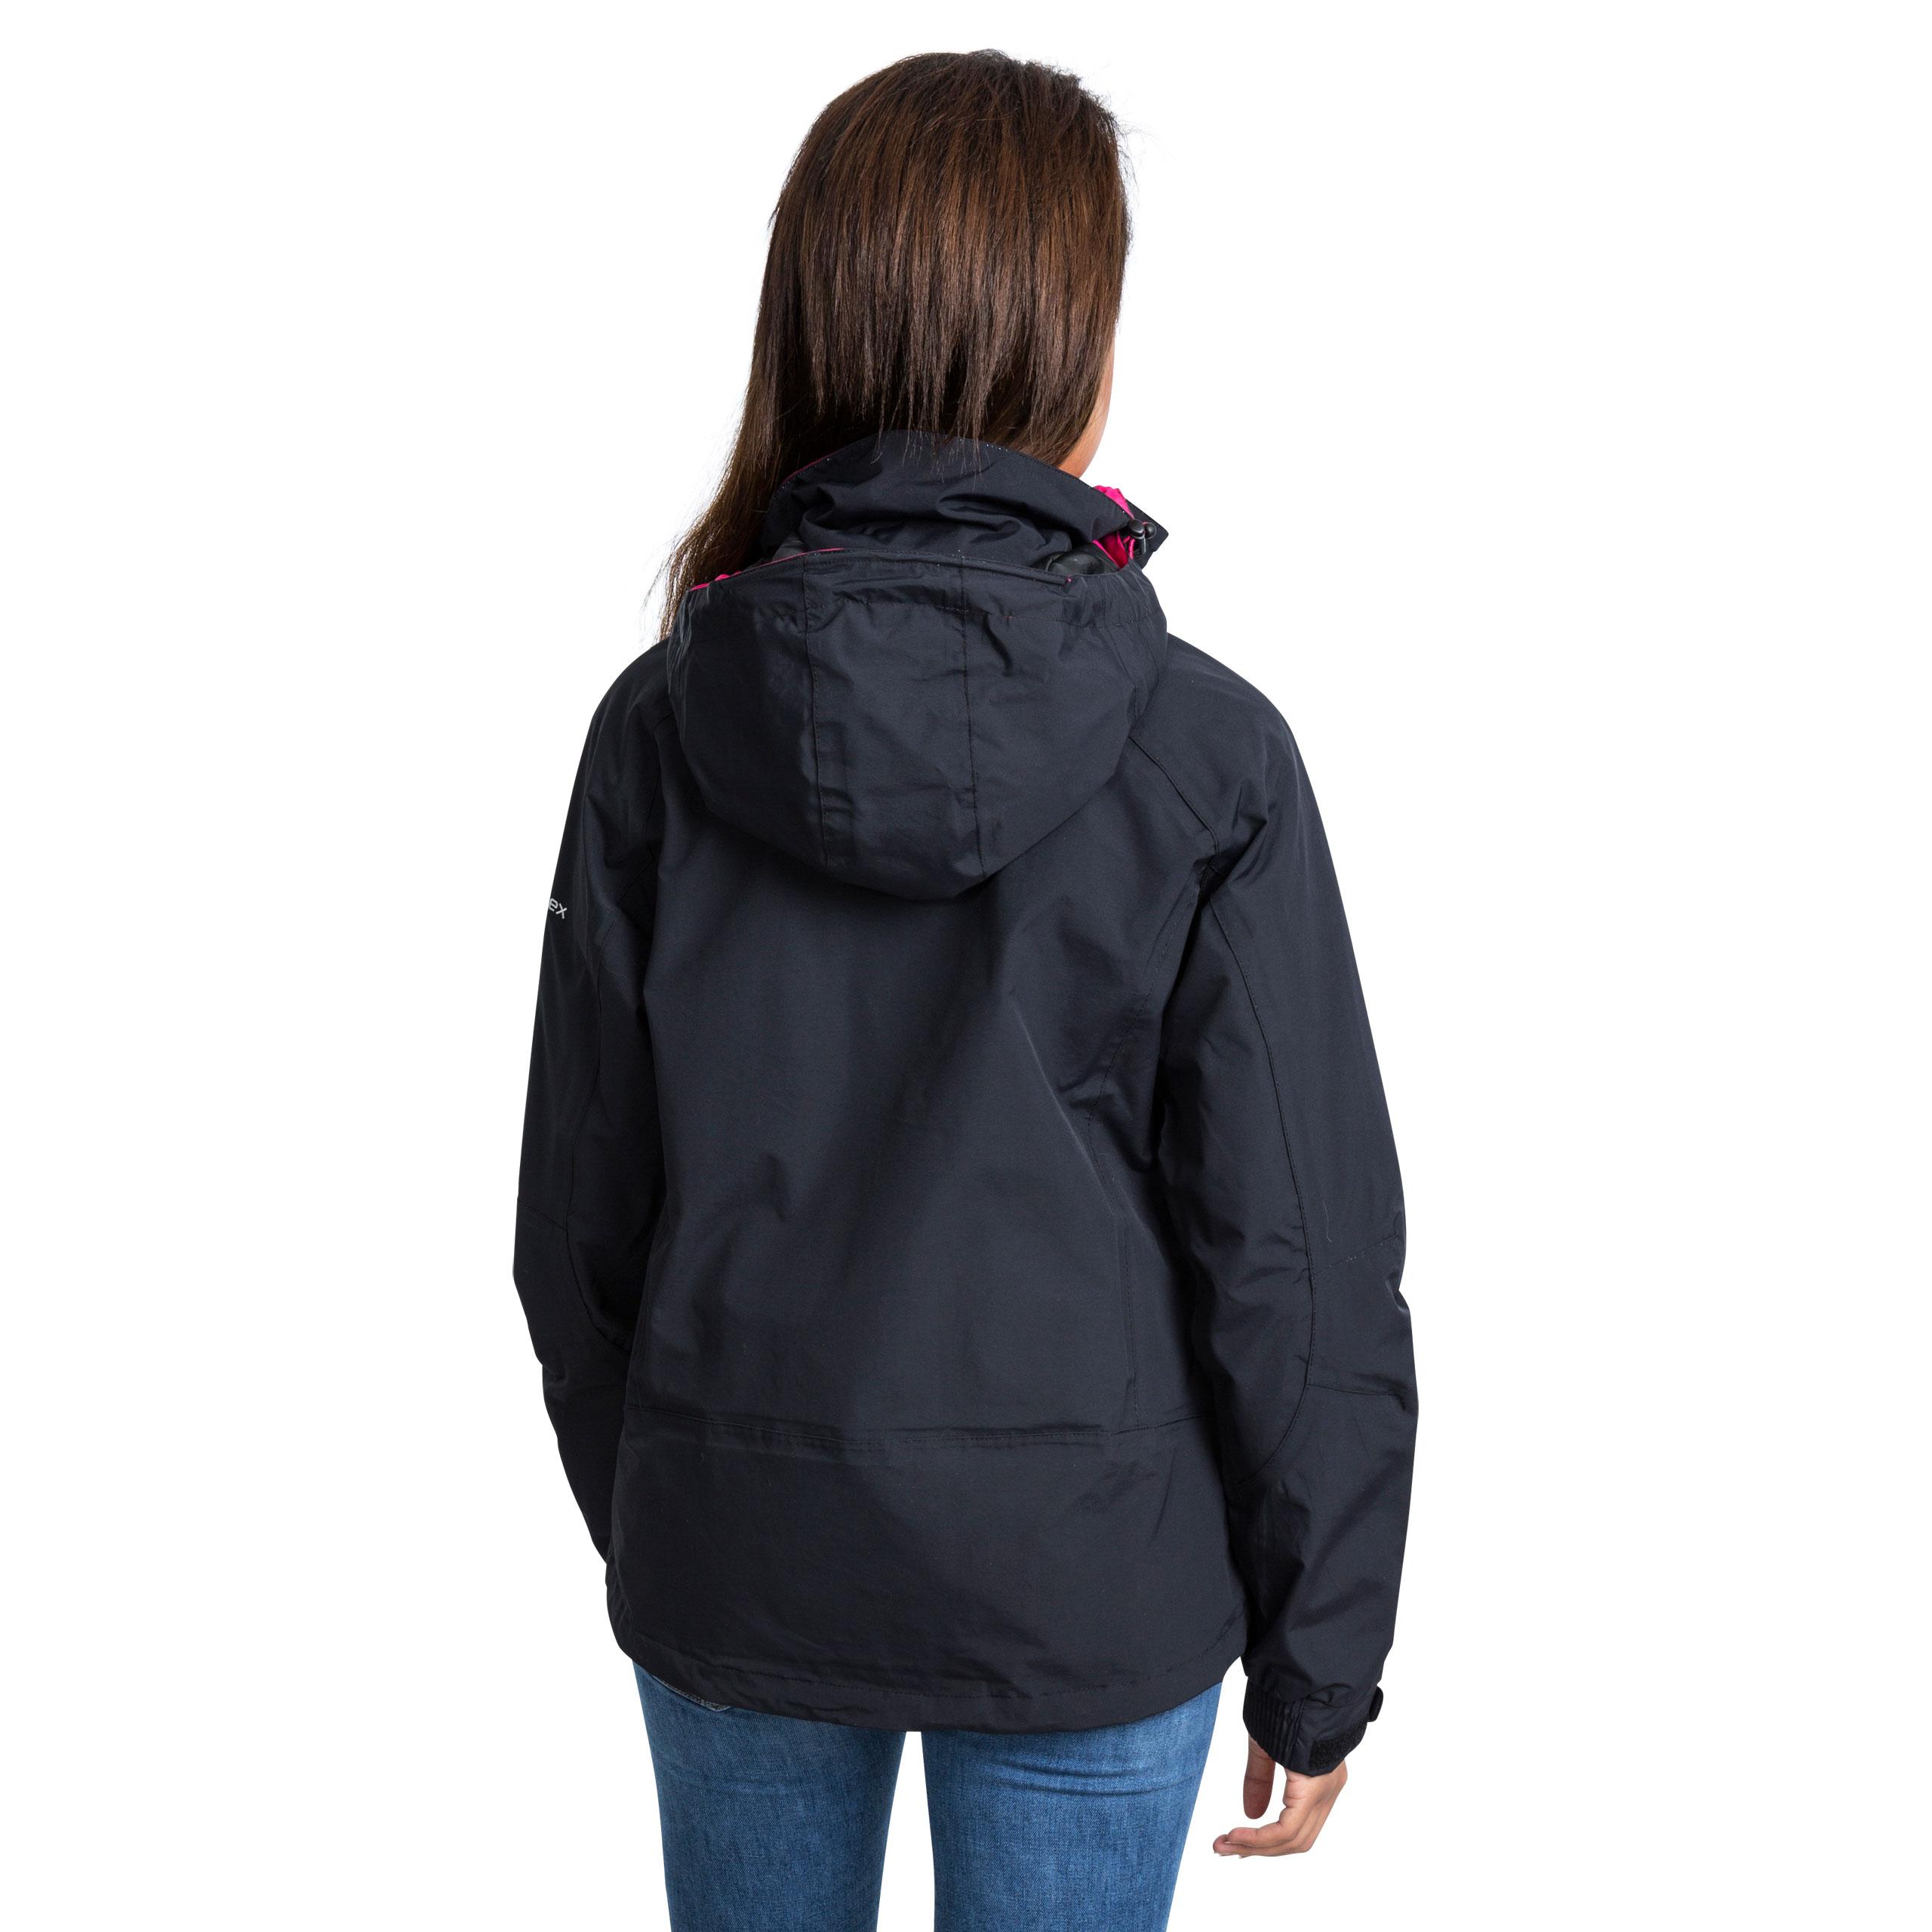 Trespass-Florissant-Womens-Waterproof-Jacket-Black-Navy-Rain-Coat-with-Hood miniatuur 16